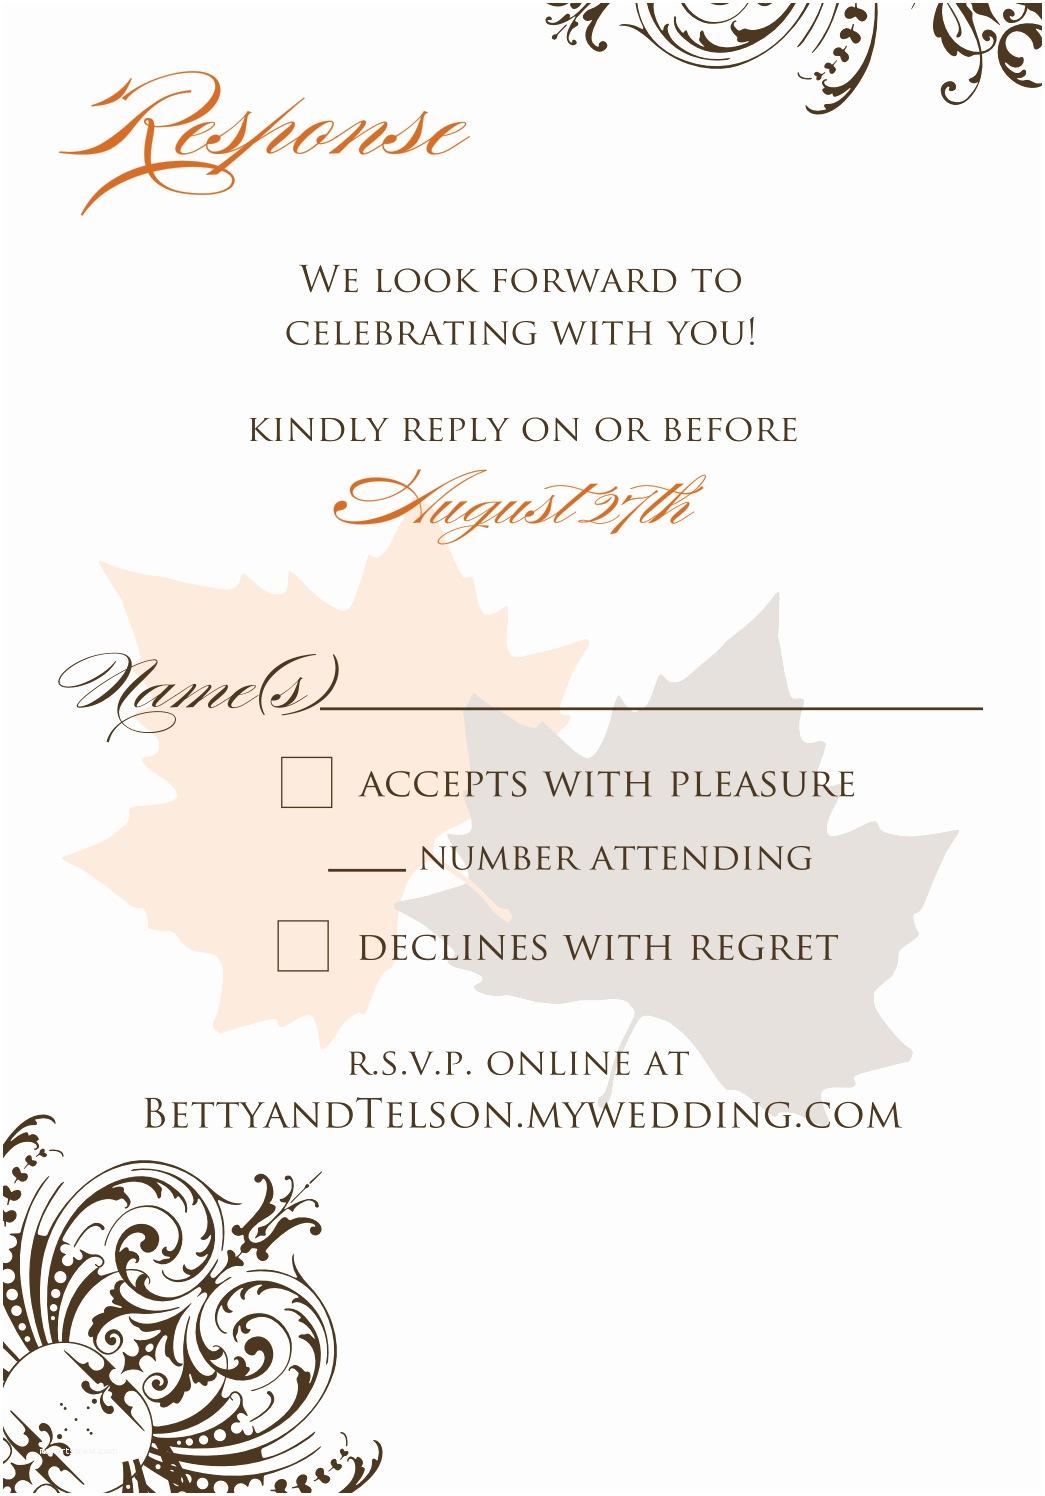 Funny Wedding Invitation Wording Funny Wedding Invitation Verses Yaseen